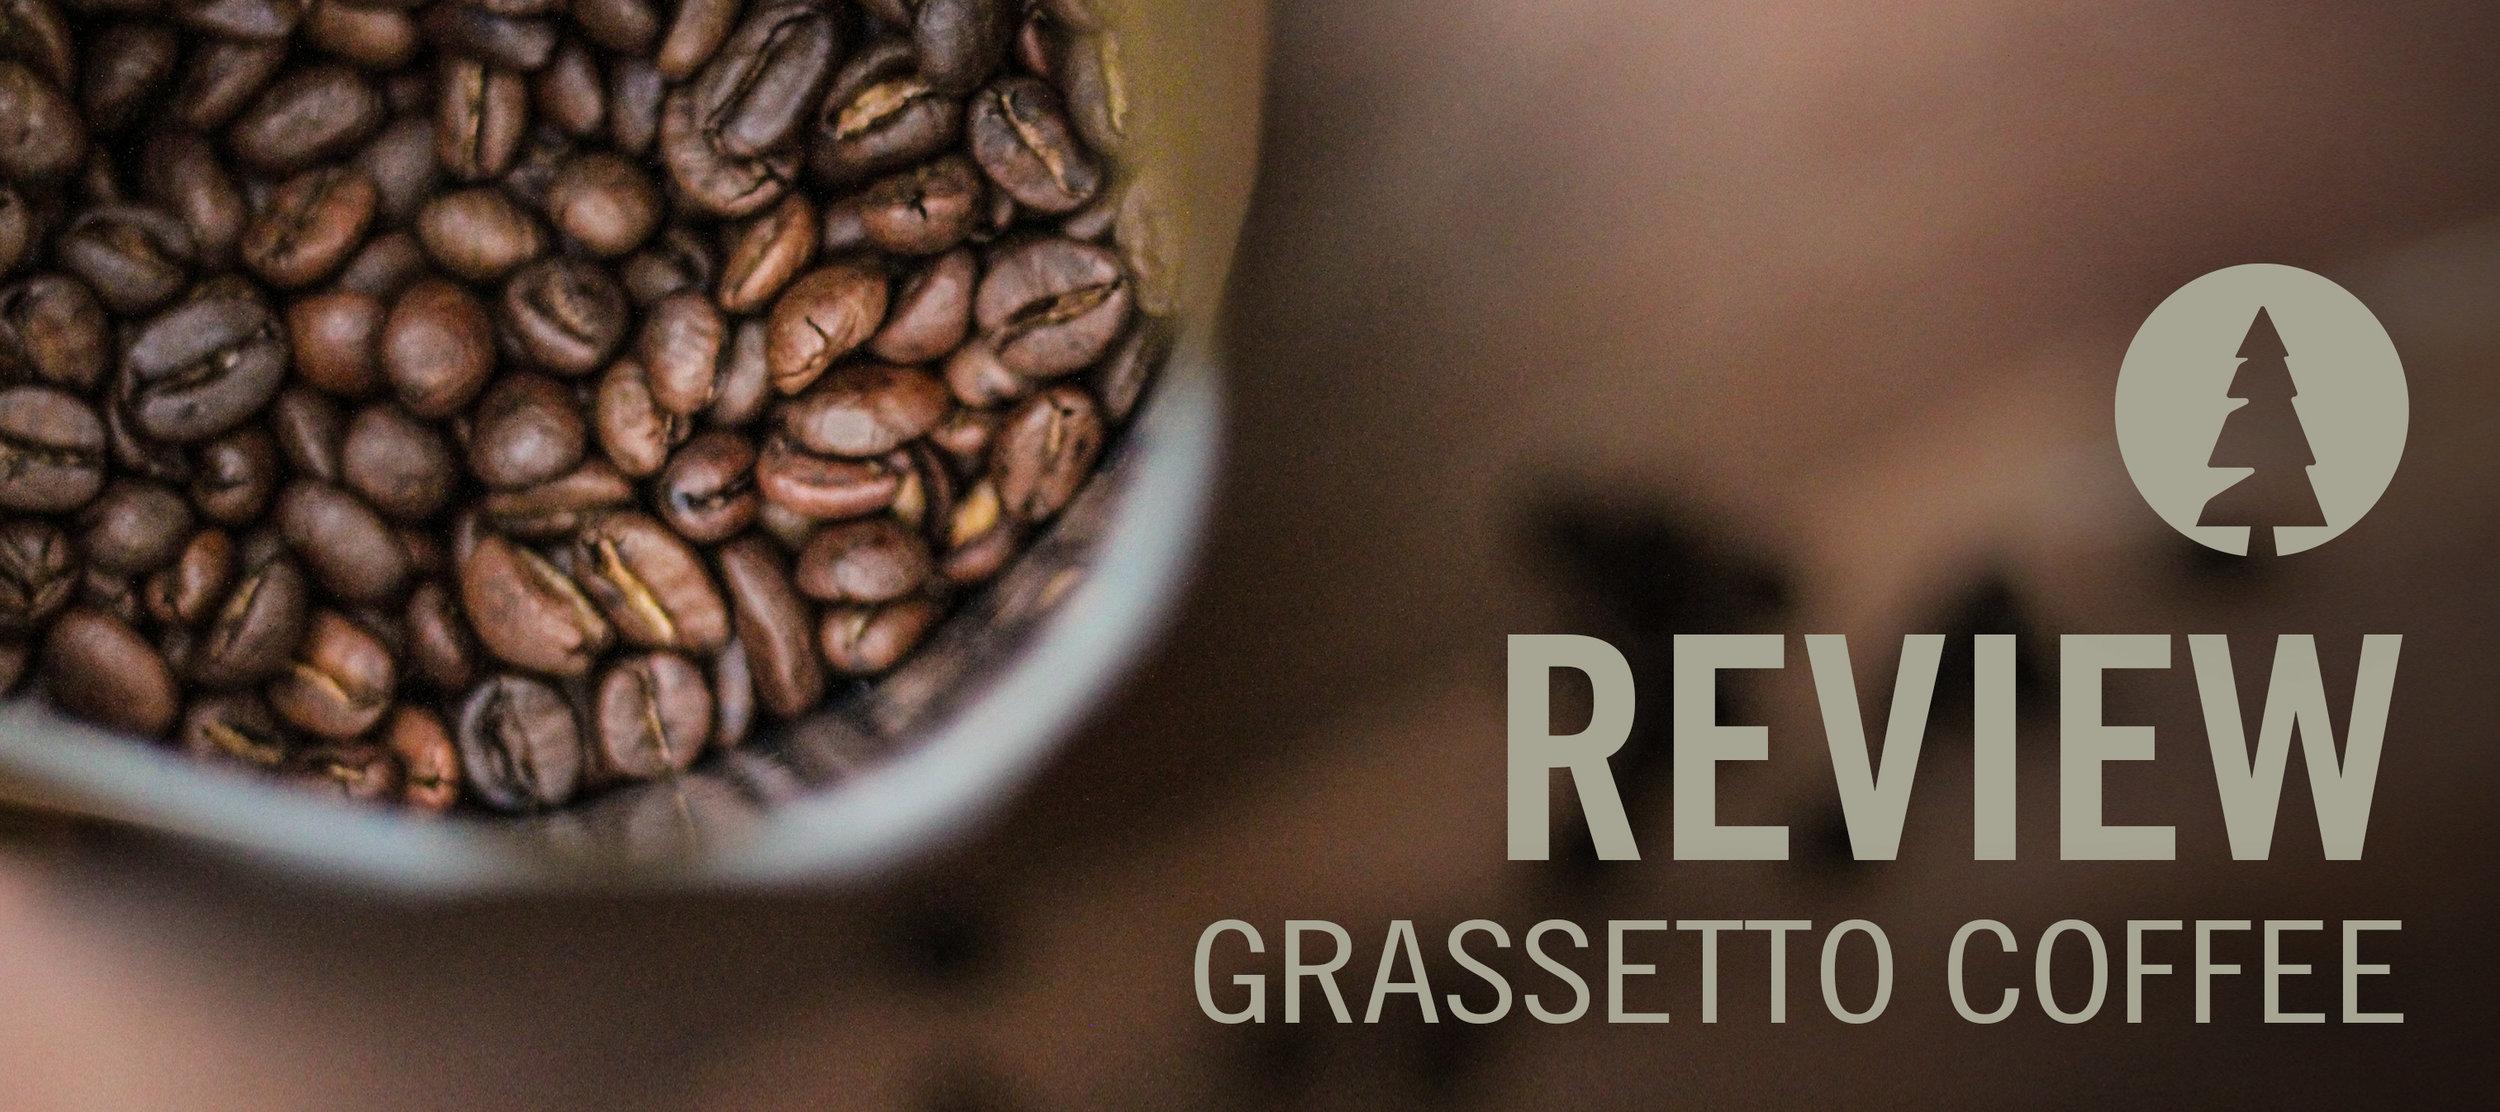 Coffee-Review-Narrow.jpg